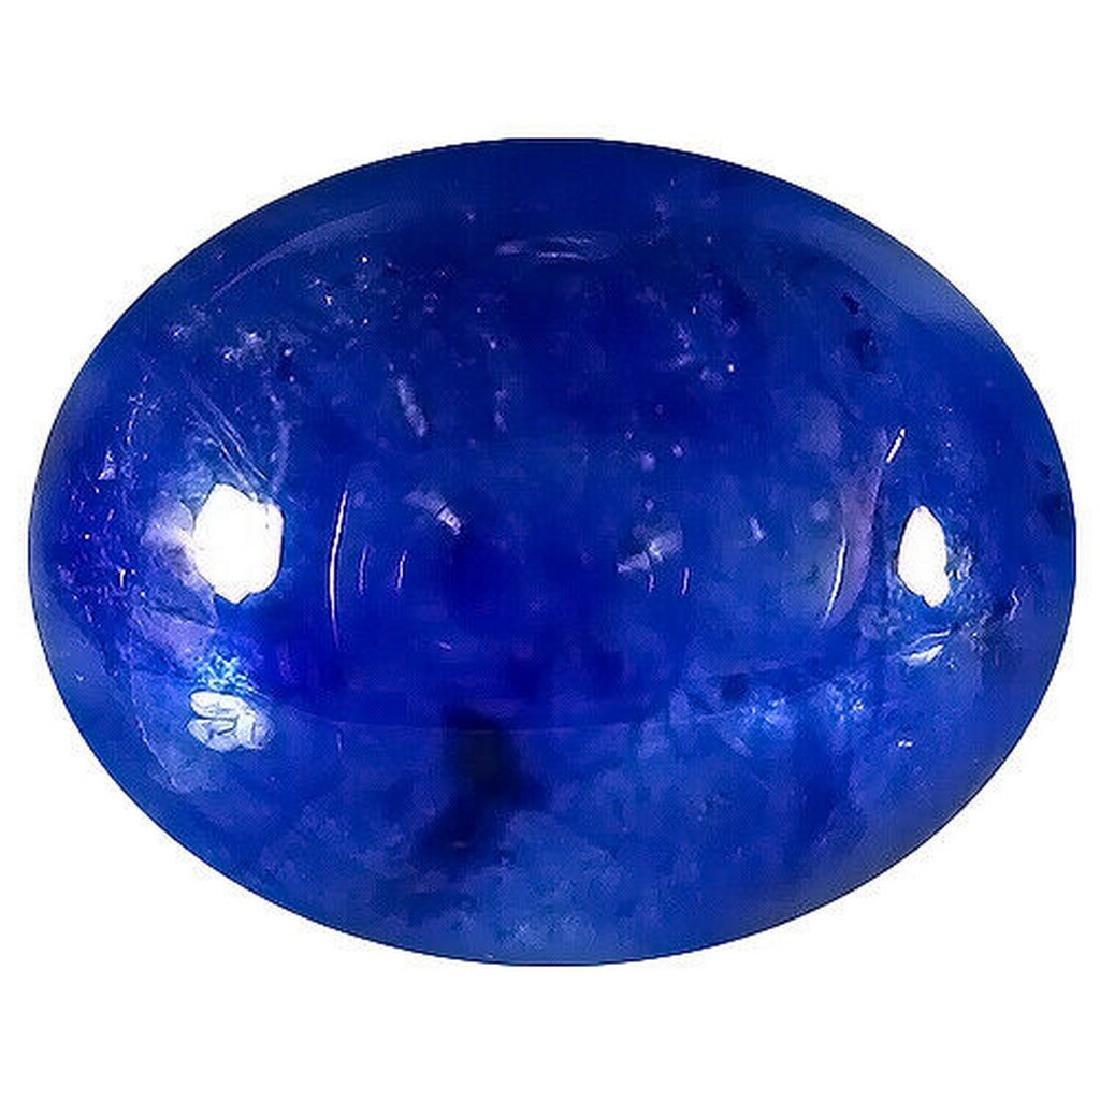 5.56 ct AAAA grade blue sapphire cab